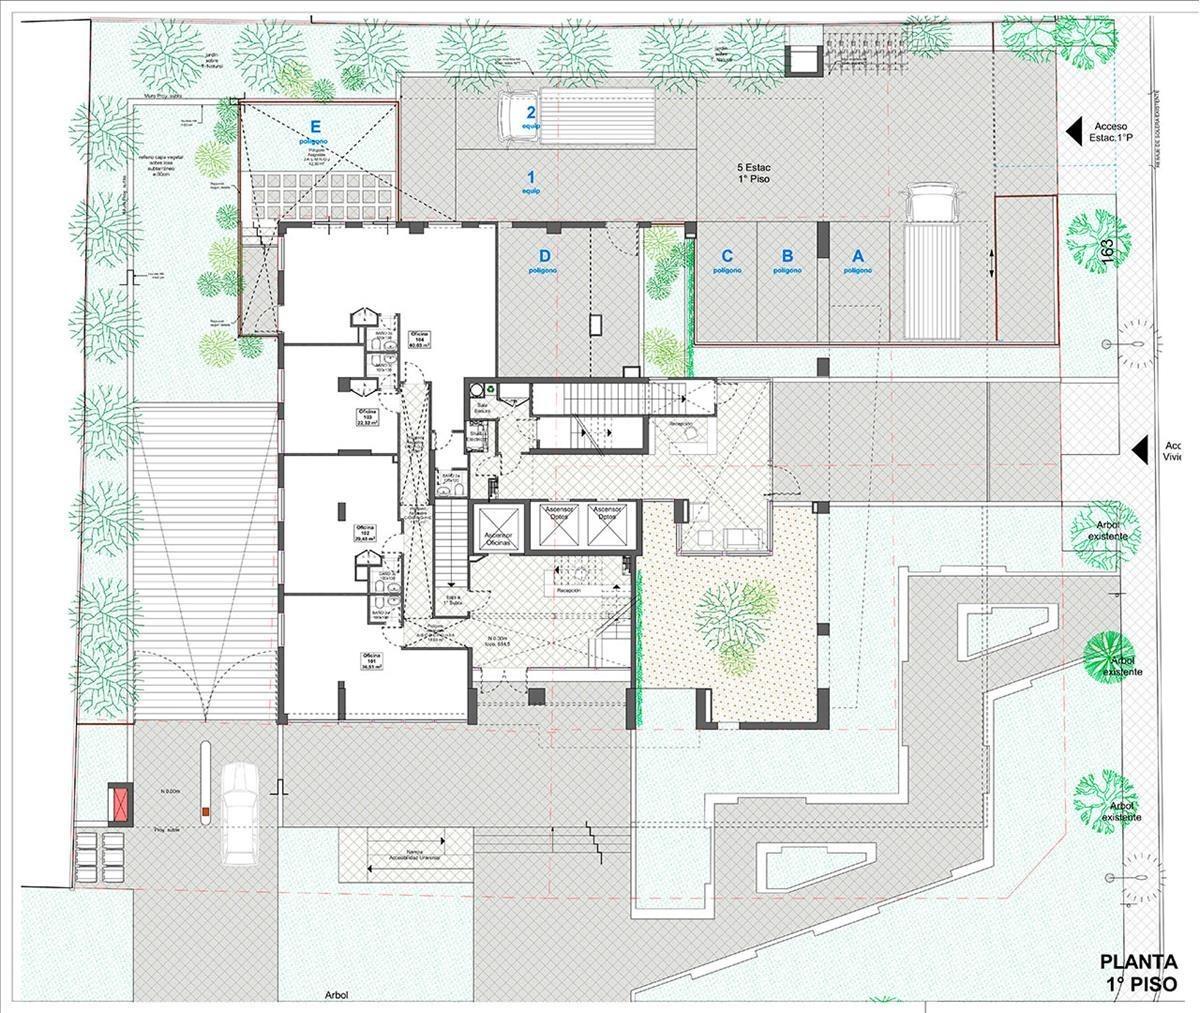 proyecto edificio nevería oriente - oficinas